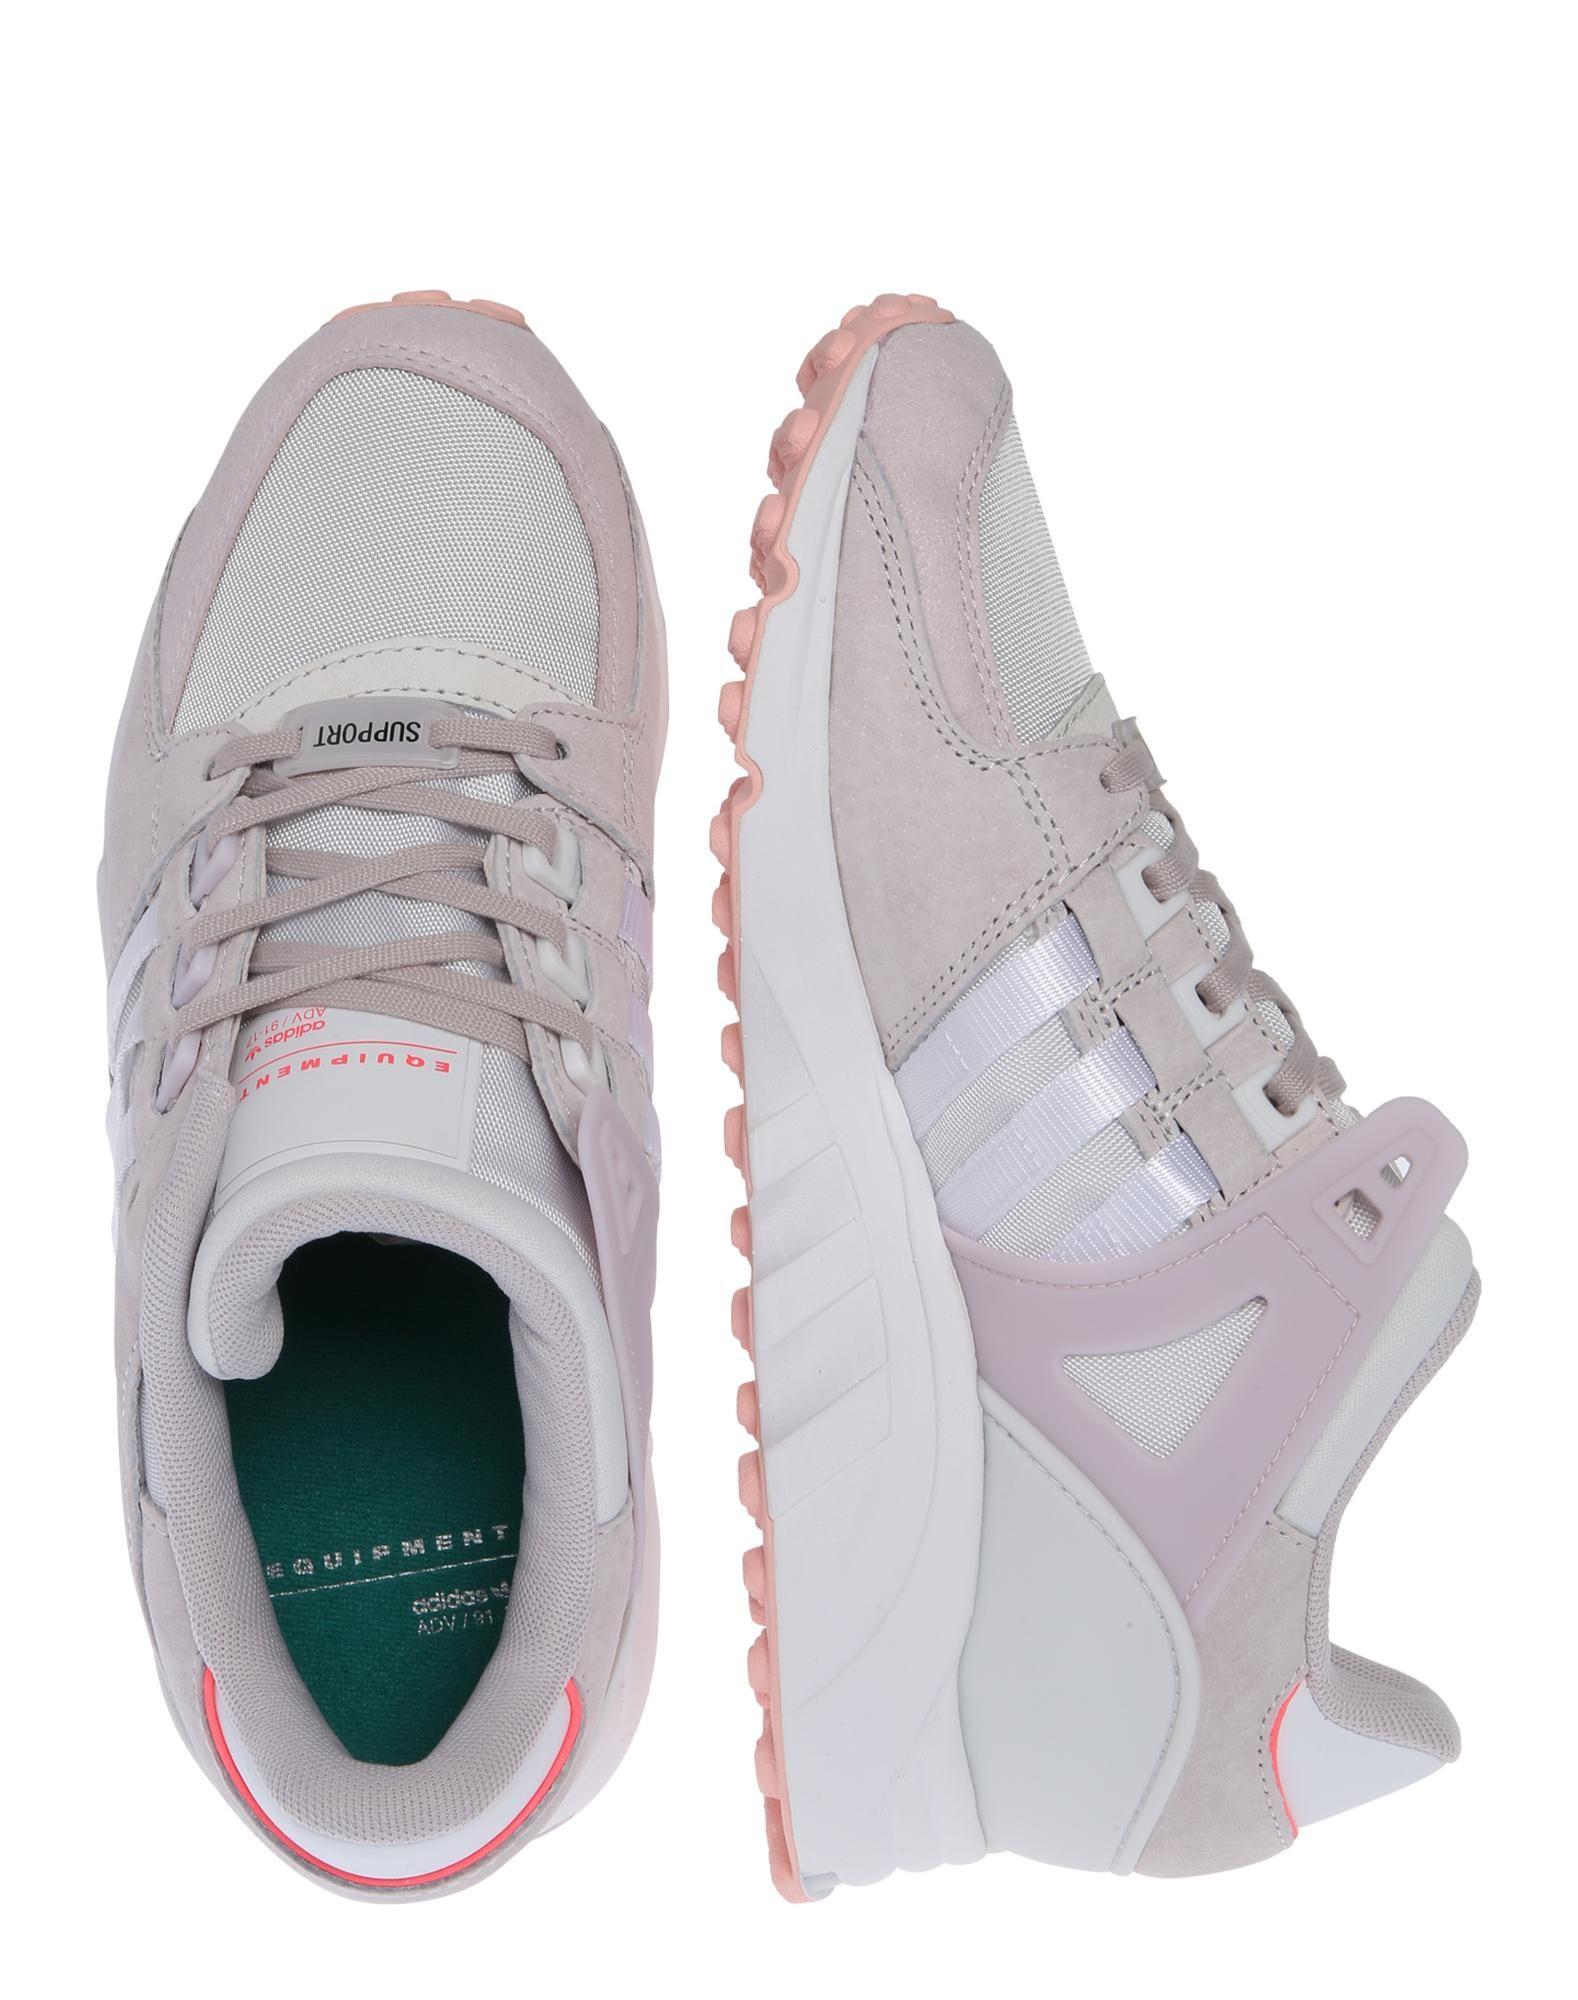 Originals Rf Support Sneaker Adidas 'eqt W'Schuhe tsxhQrdC